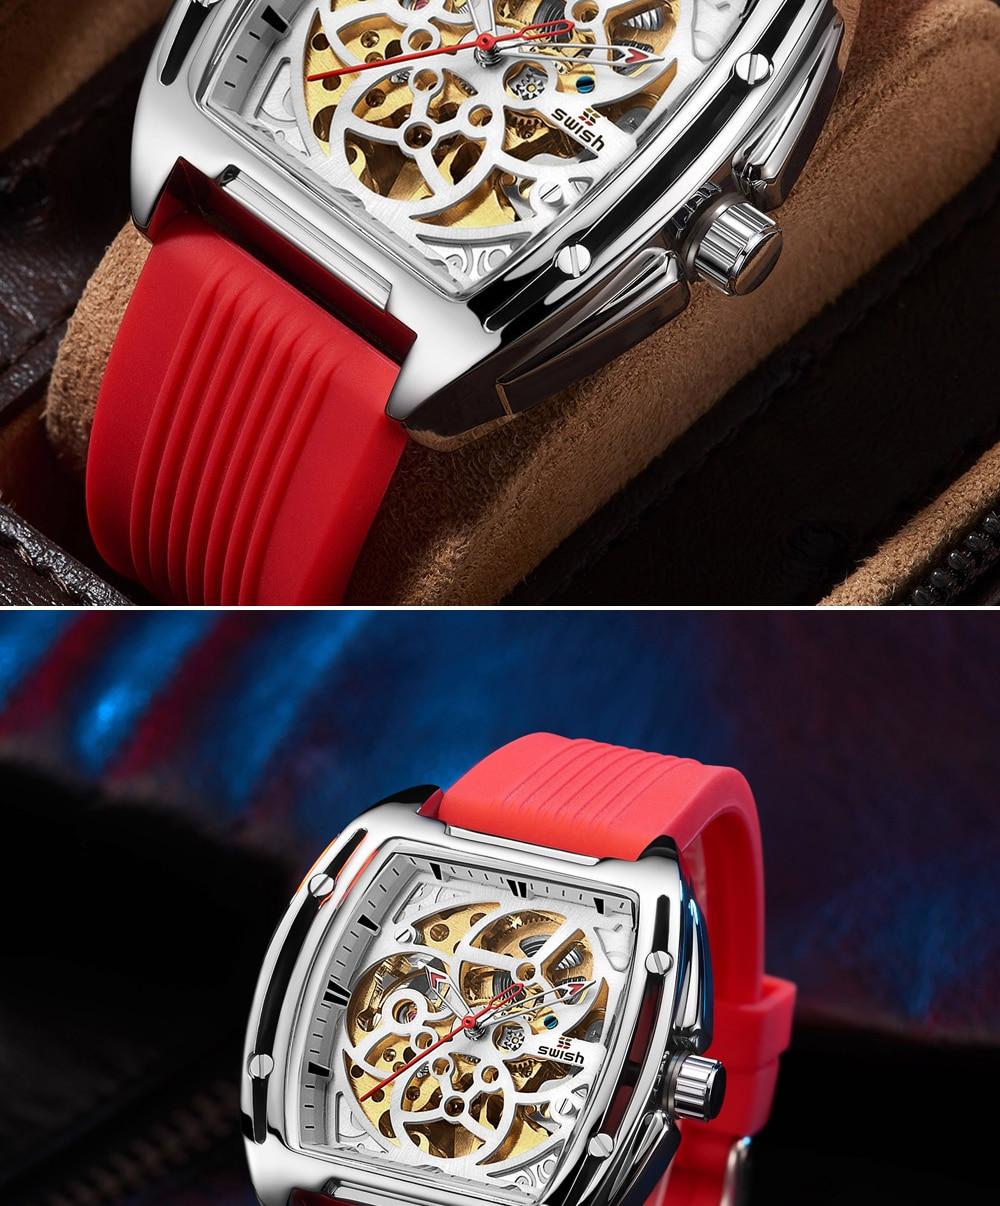 H37bfb5994be14af2a0e056737770513cq SWISH Brand Design Luxury Men's Mechanical Wristwatch